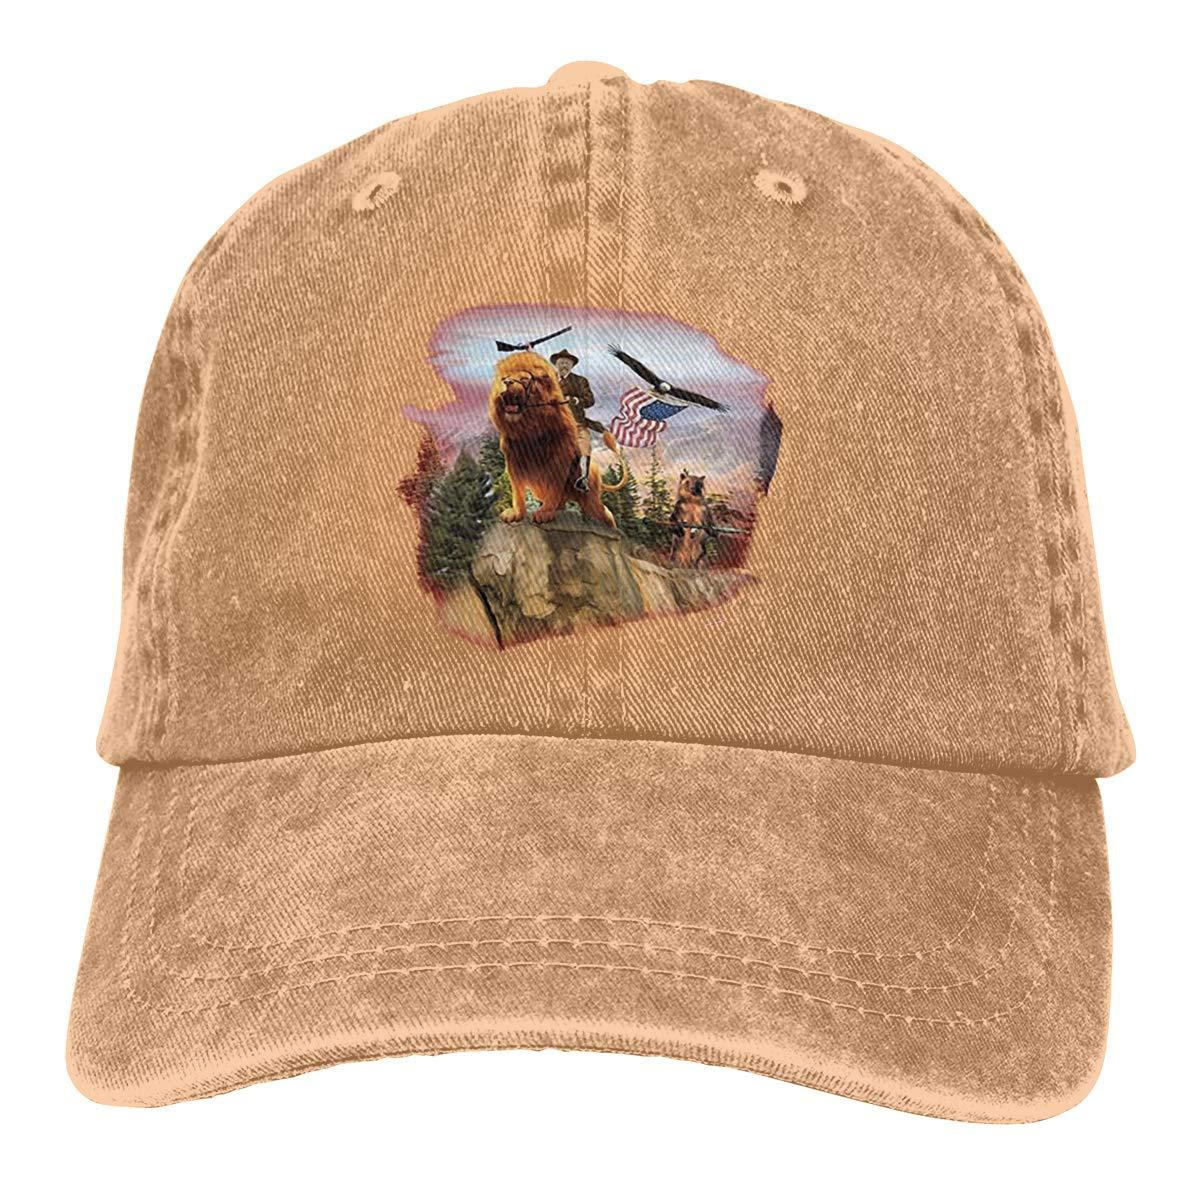 Teddy Roosevelt Riding Lion Cowboy Hat Dad Hats Ball Denim Cap for Mens Womens